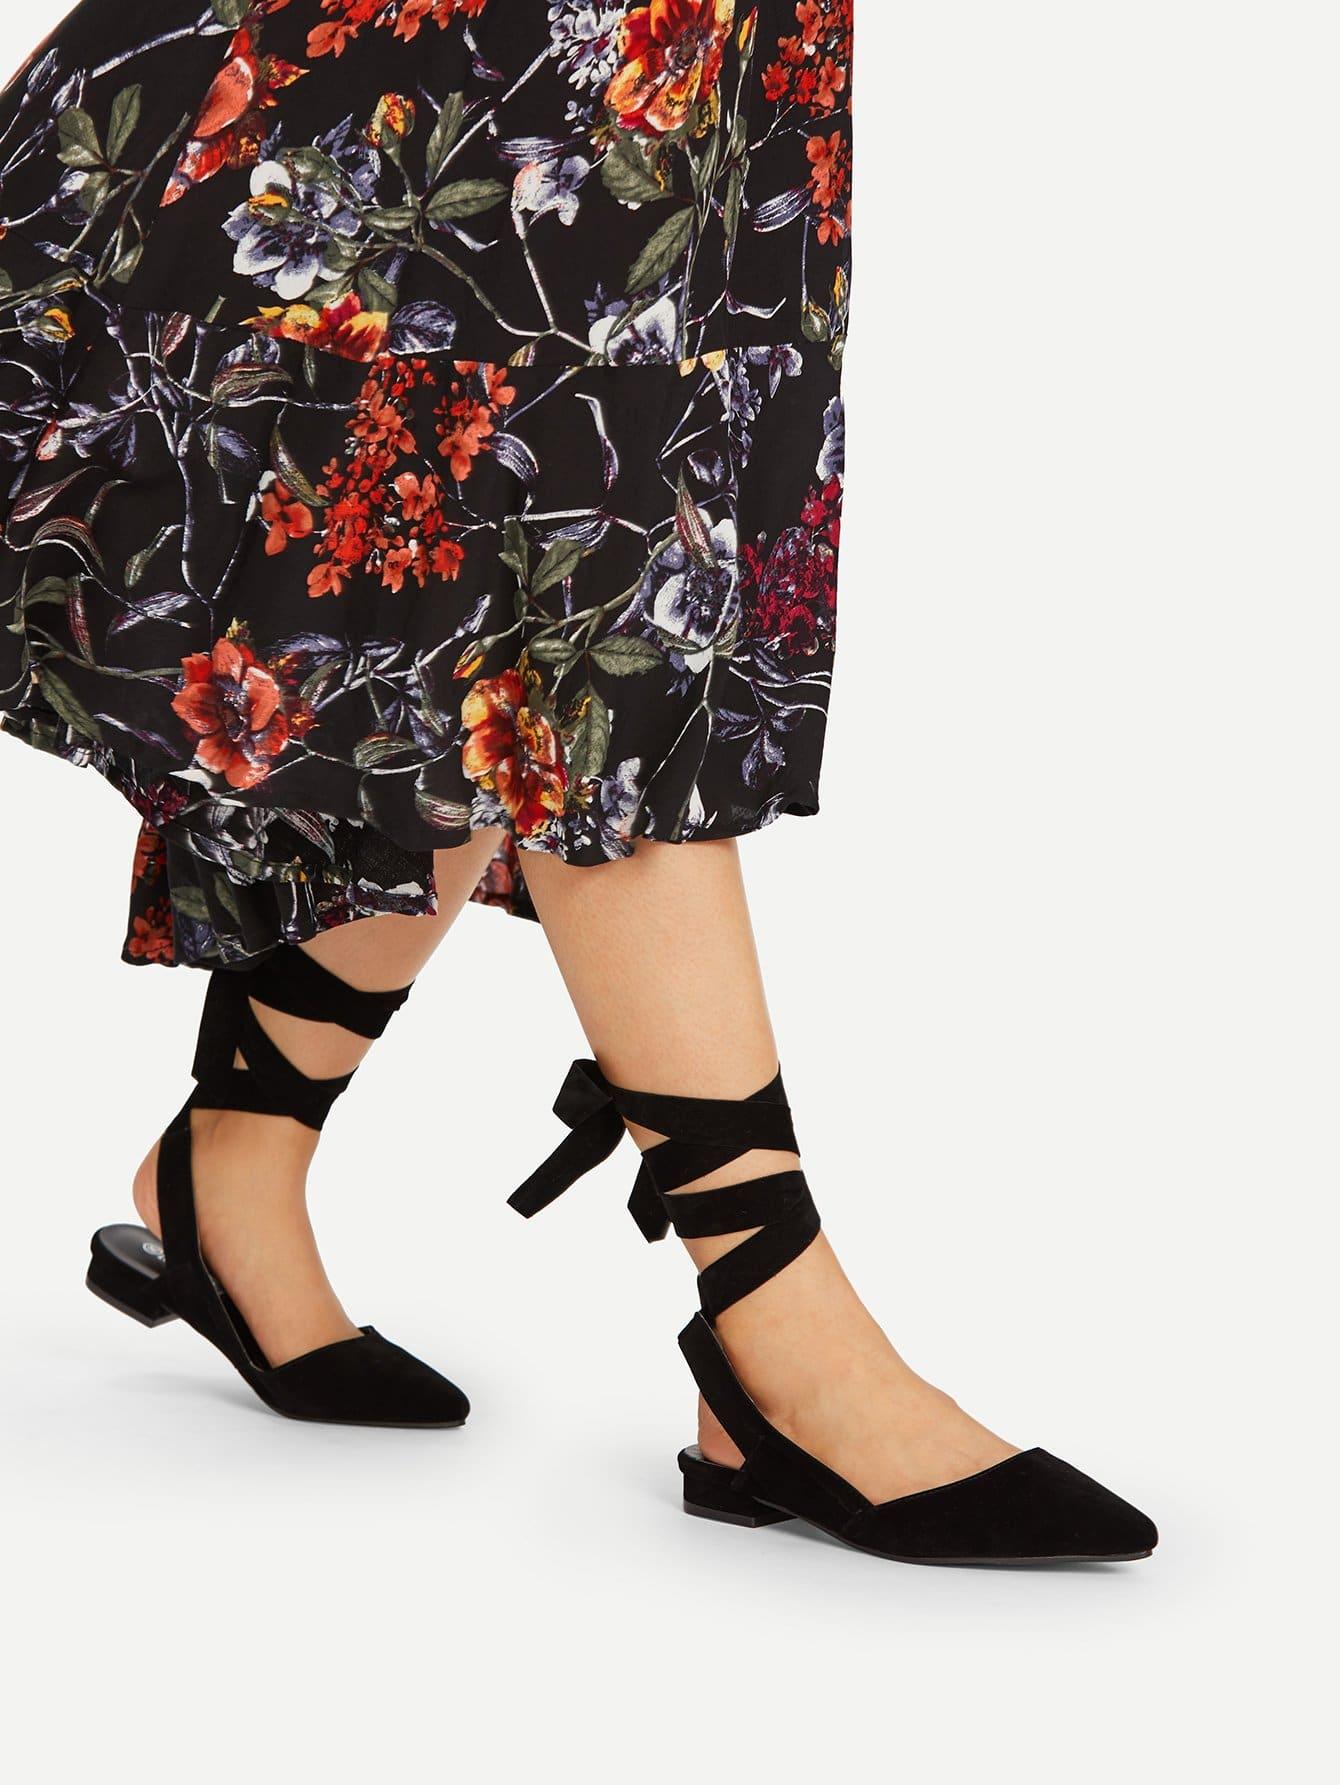 Pointed Toe Tie Leg Flats pointed toe tie leg flats